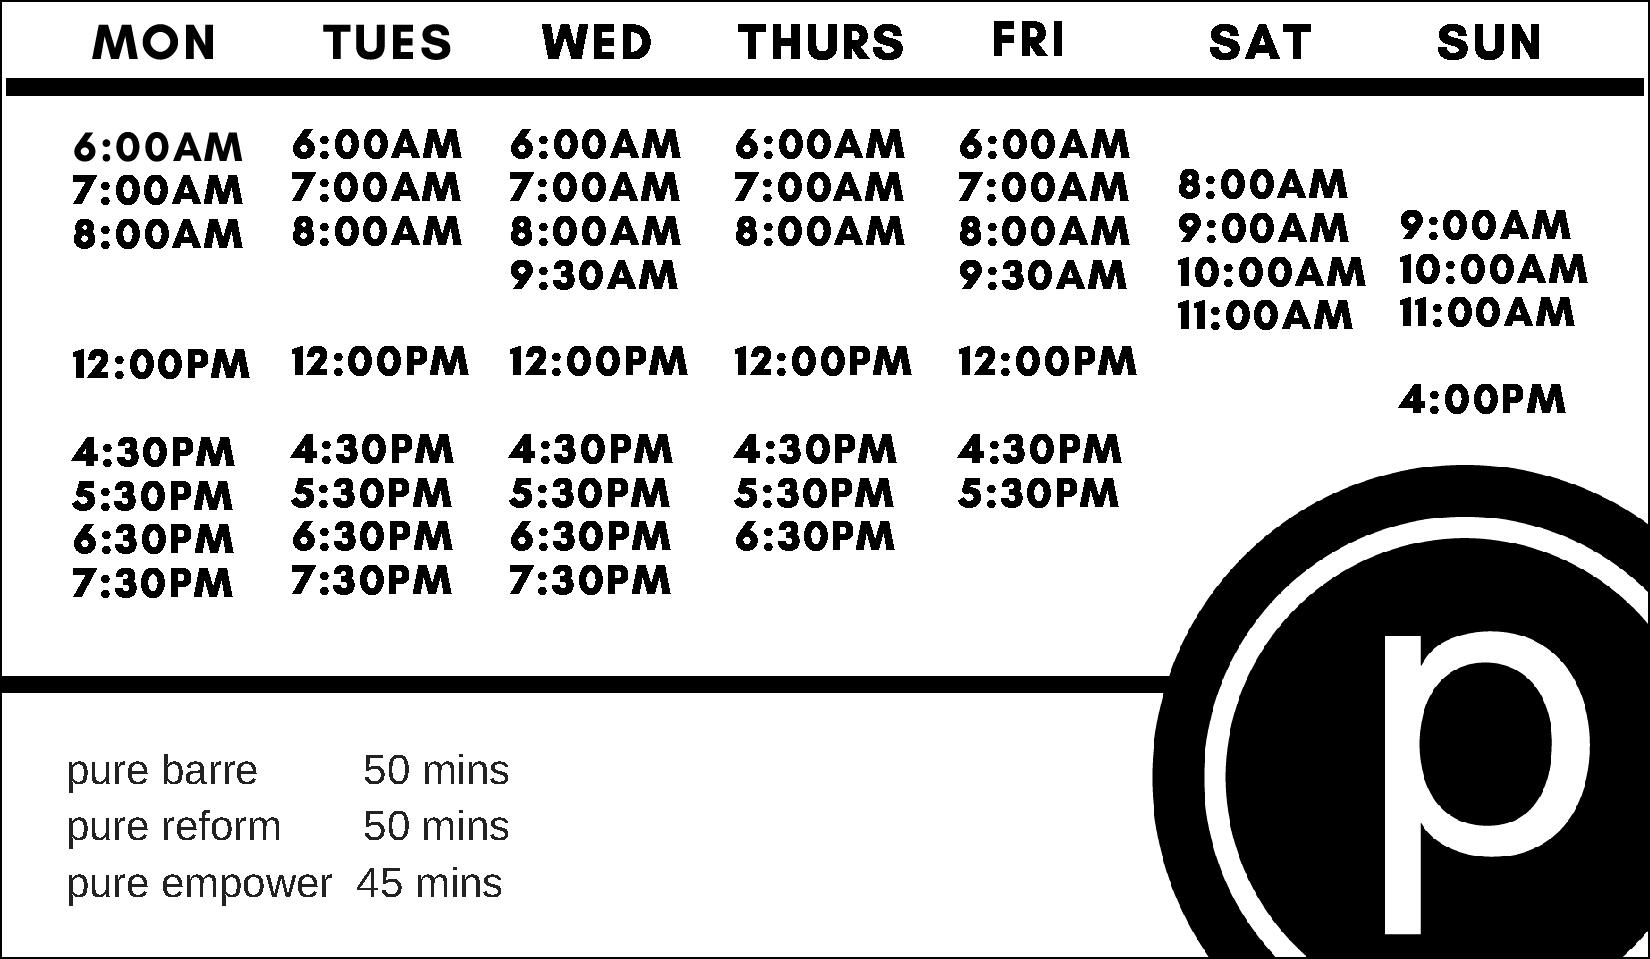 Downtown Indy Schedule2.jpg